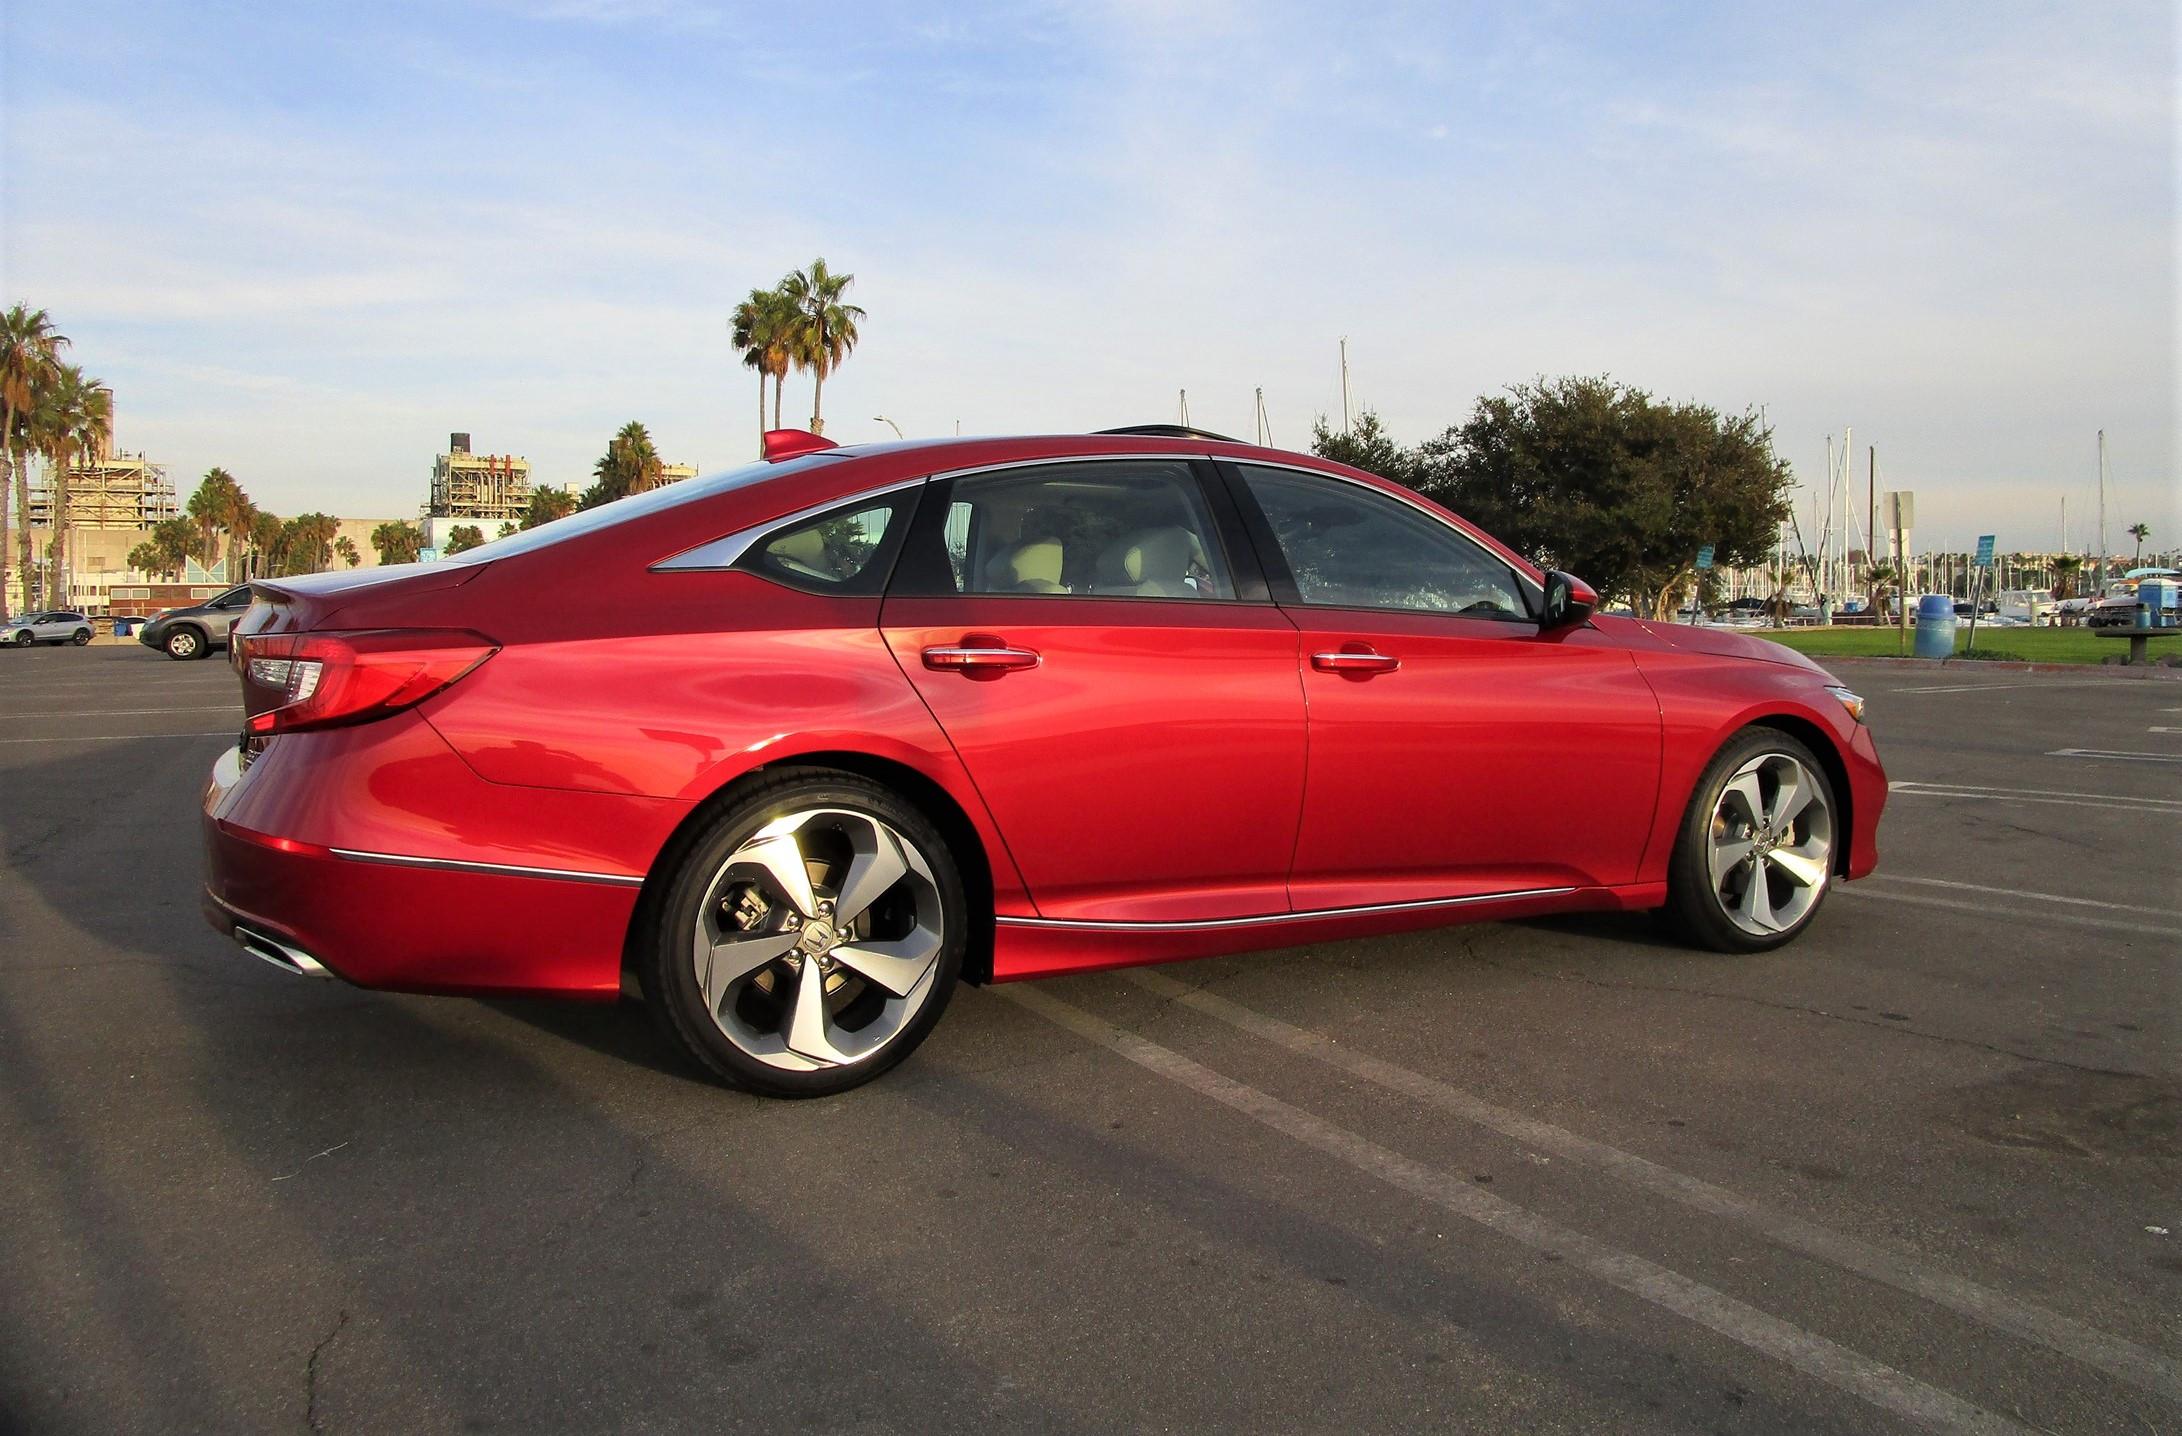 2020 Honda Accord Touring 2 0t Review By Ben Lewis Car Shopping Car Revs Daily Com